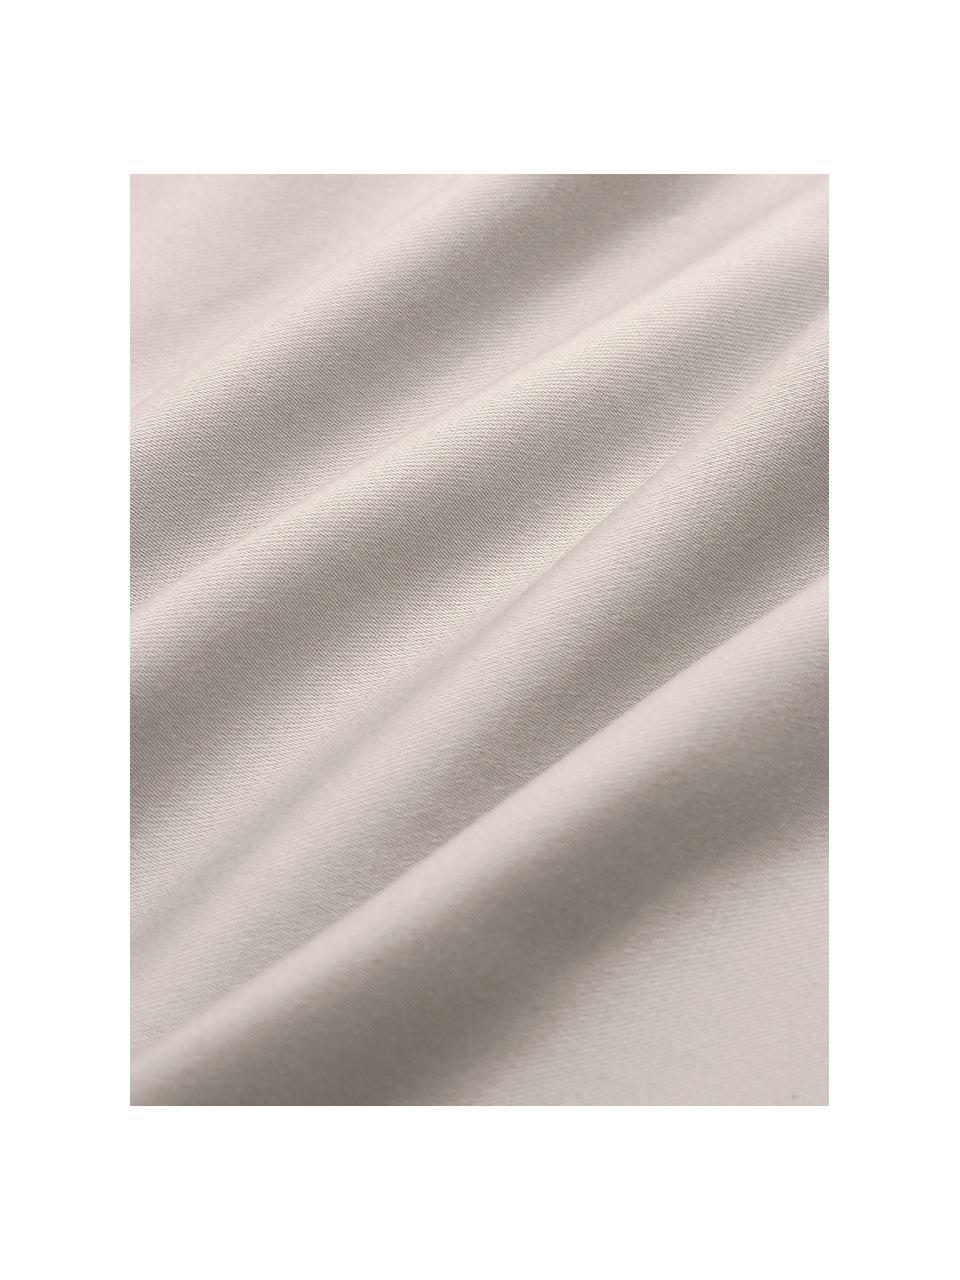 Lenzuolo con angoli in cotone biologico taupe Premium, Taupe, Larg. 180 x Lung. 200 cm